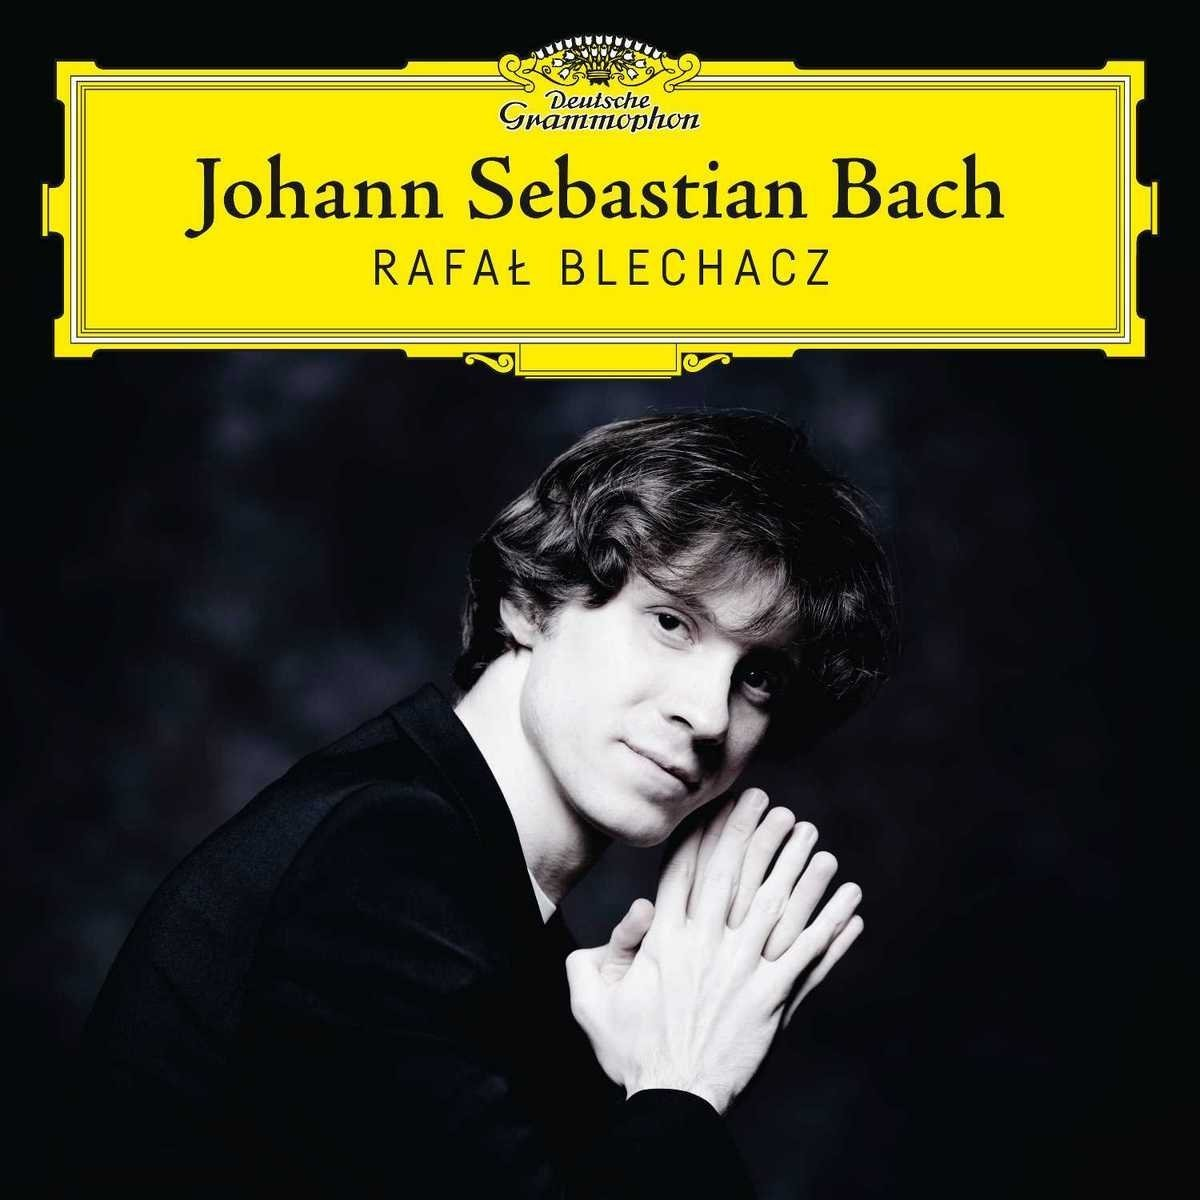 Rafał Blechacz: JS Bach Piano Recital